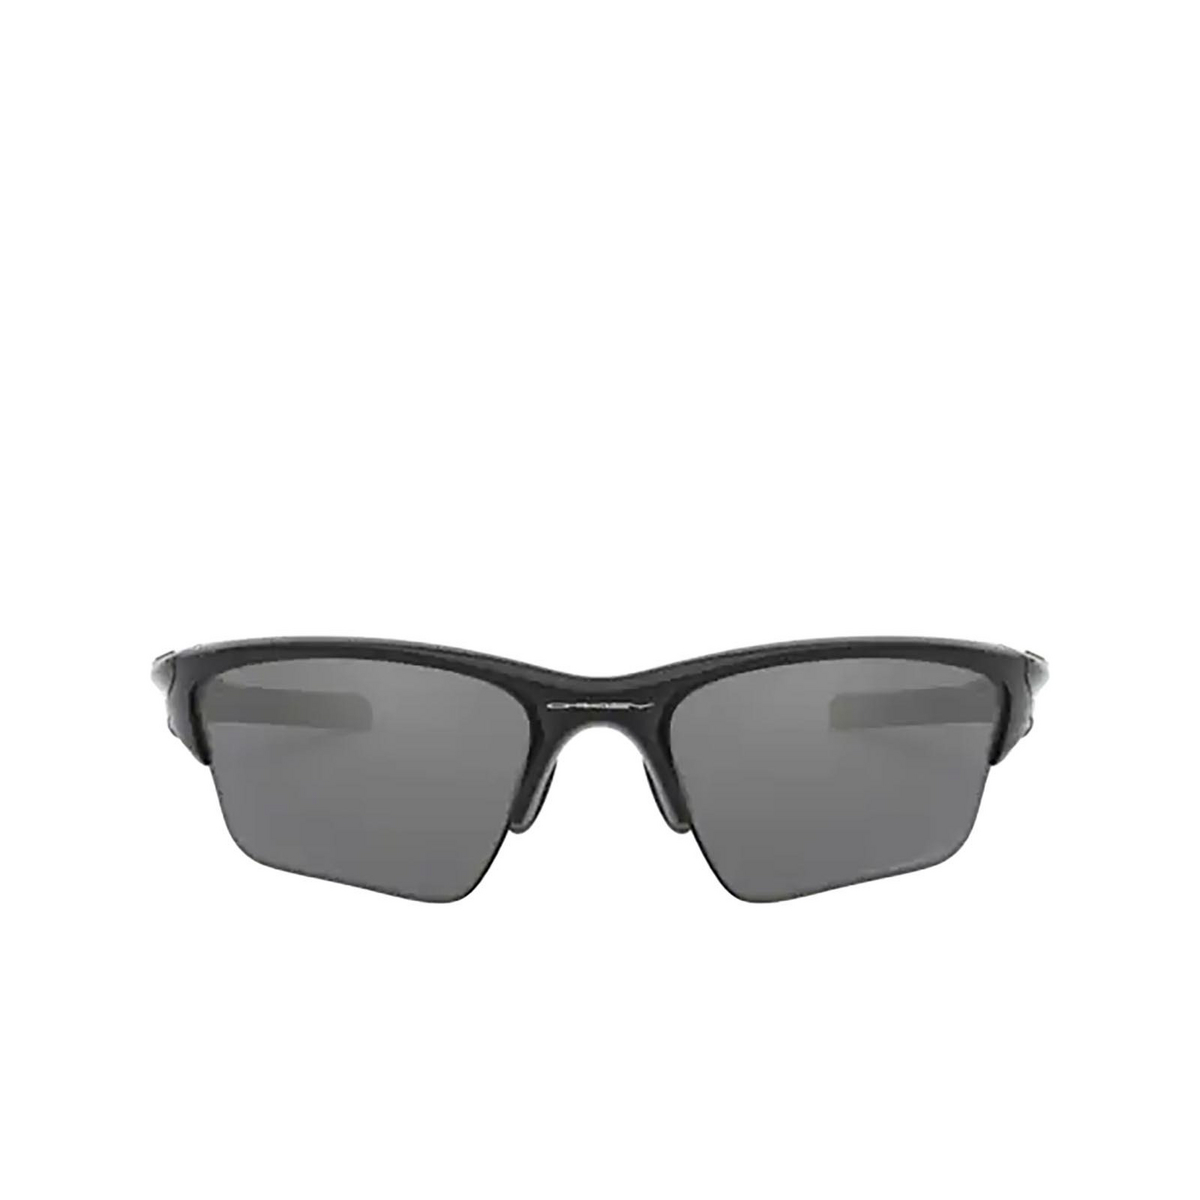 Oakley® Irregular Sunglasses: Half Jacket 2.0 Xl OO9154 color Polished Black 915405 - front view.